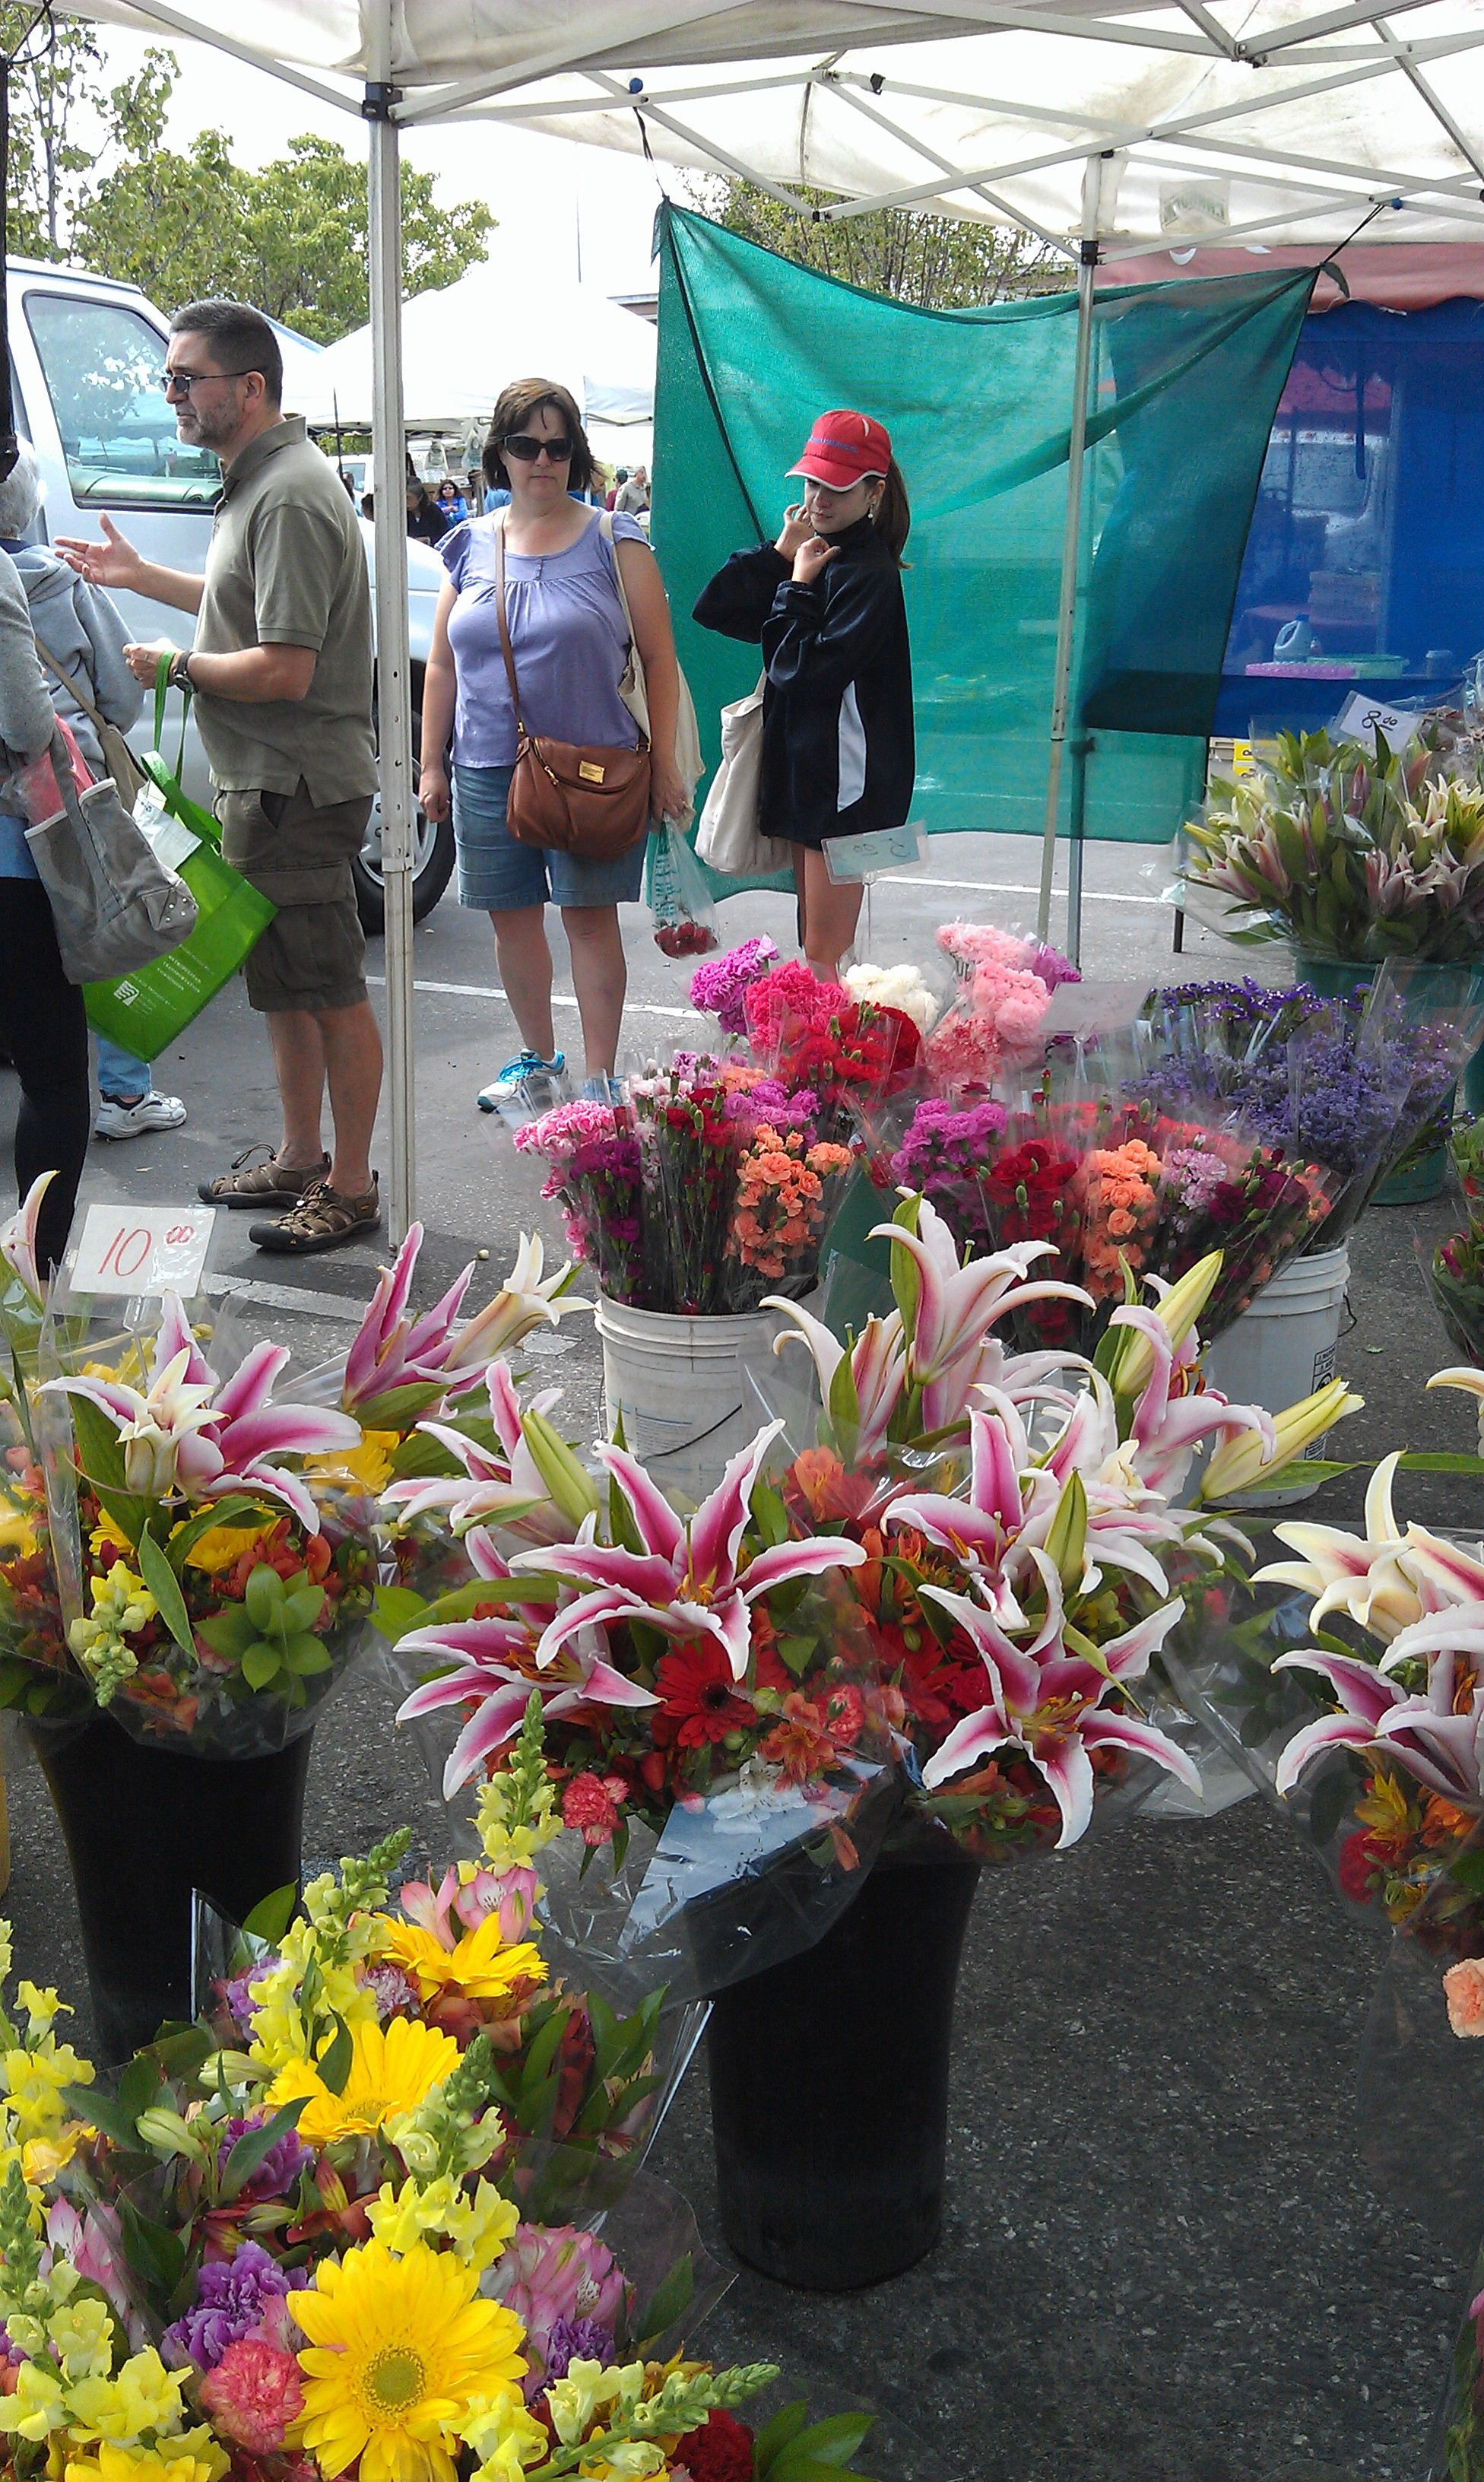 Flowers at San Jose Blossom Hill Farmers' Market